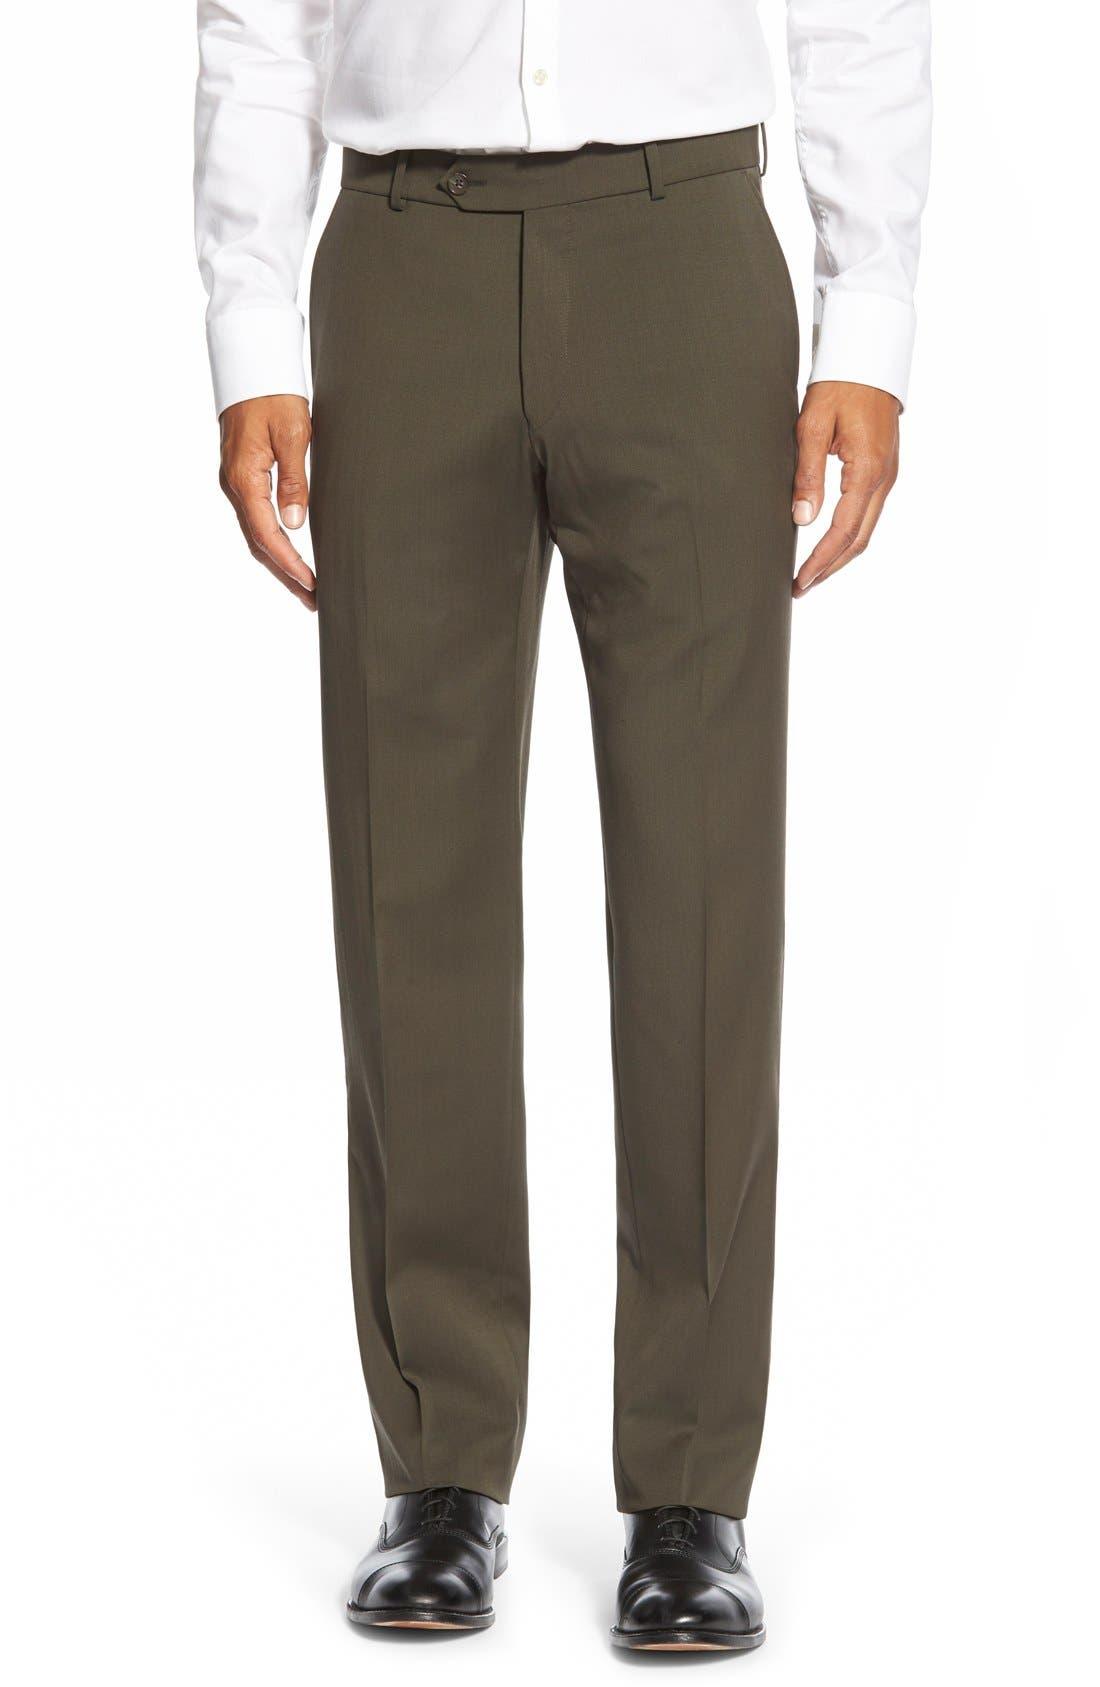 BALLIN Flat Front Solid Wool Trousers in Loden